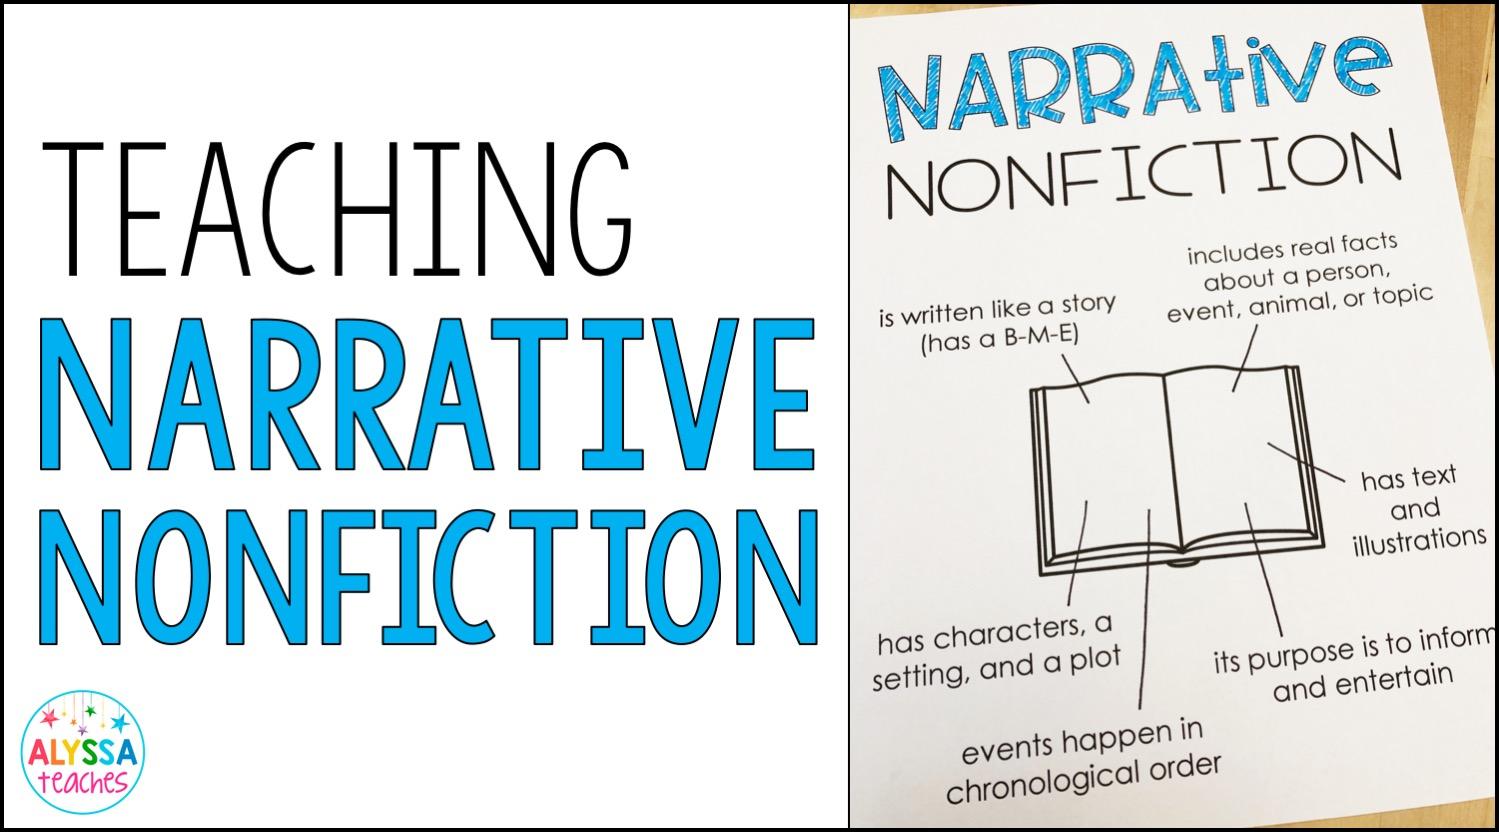 hight resolution of Teaching Narrative Nonfiction - Alyssa Teaches